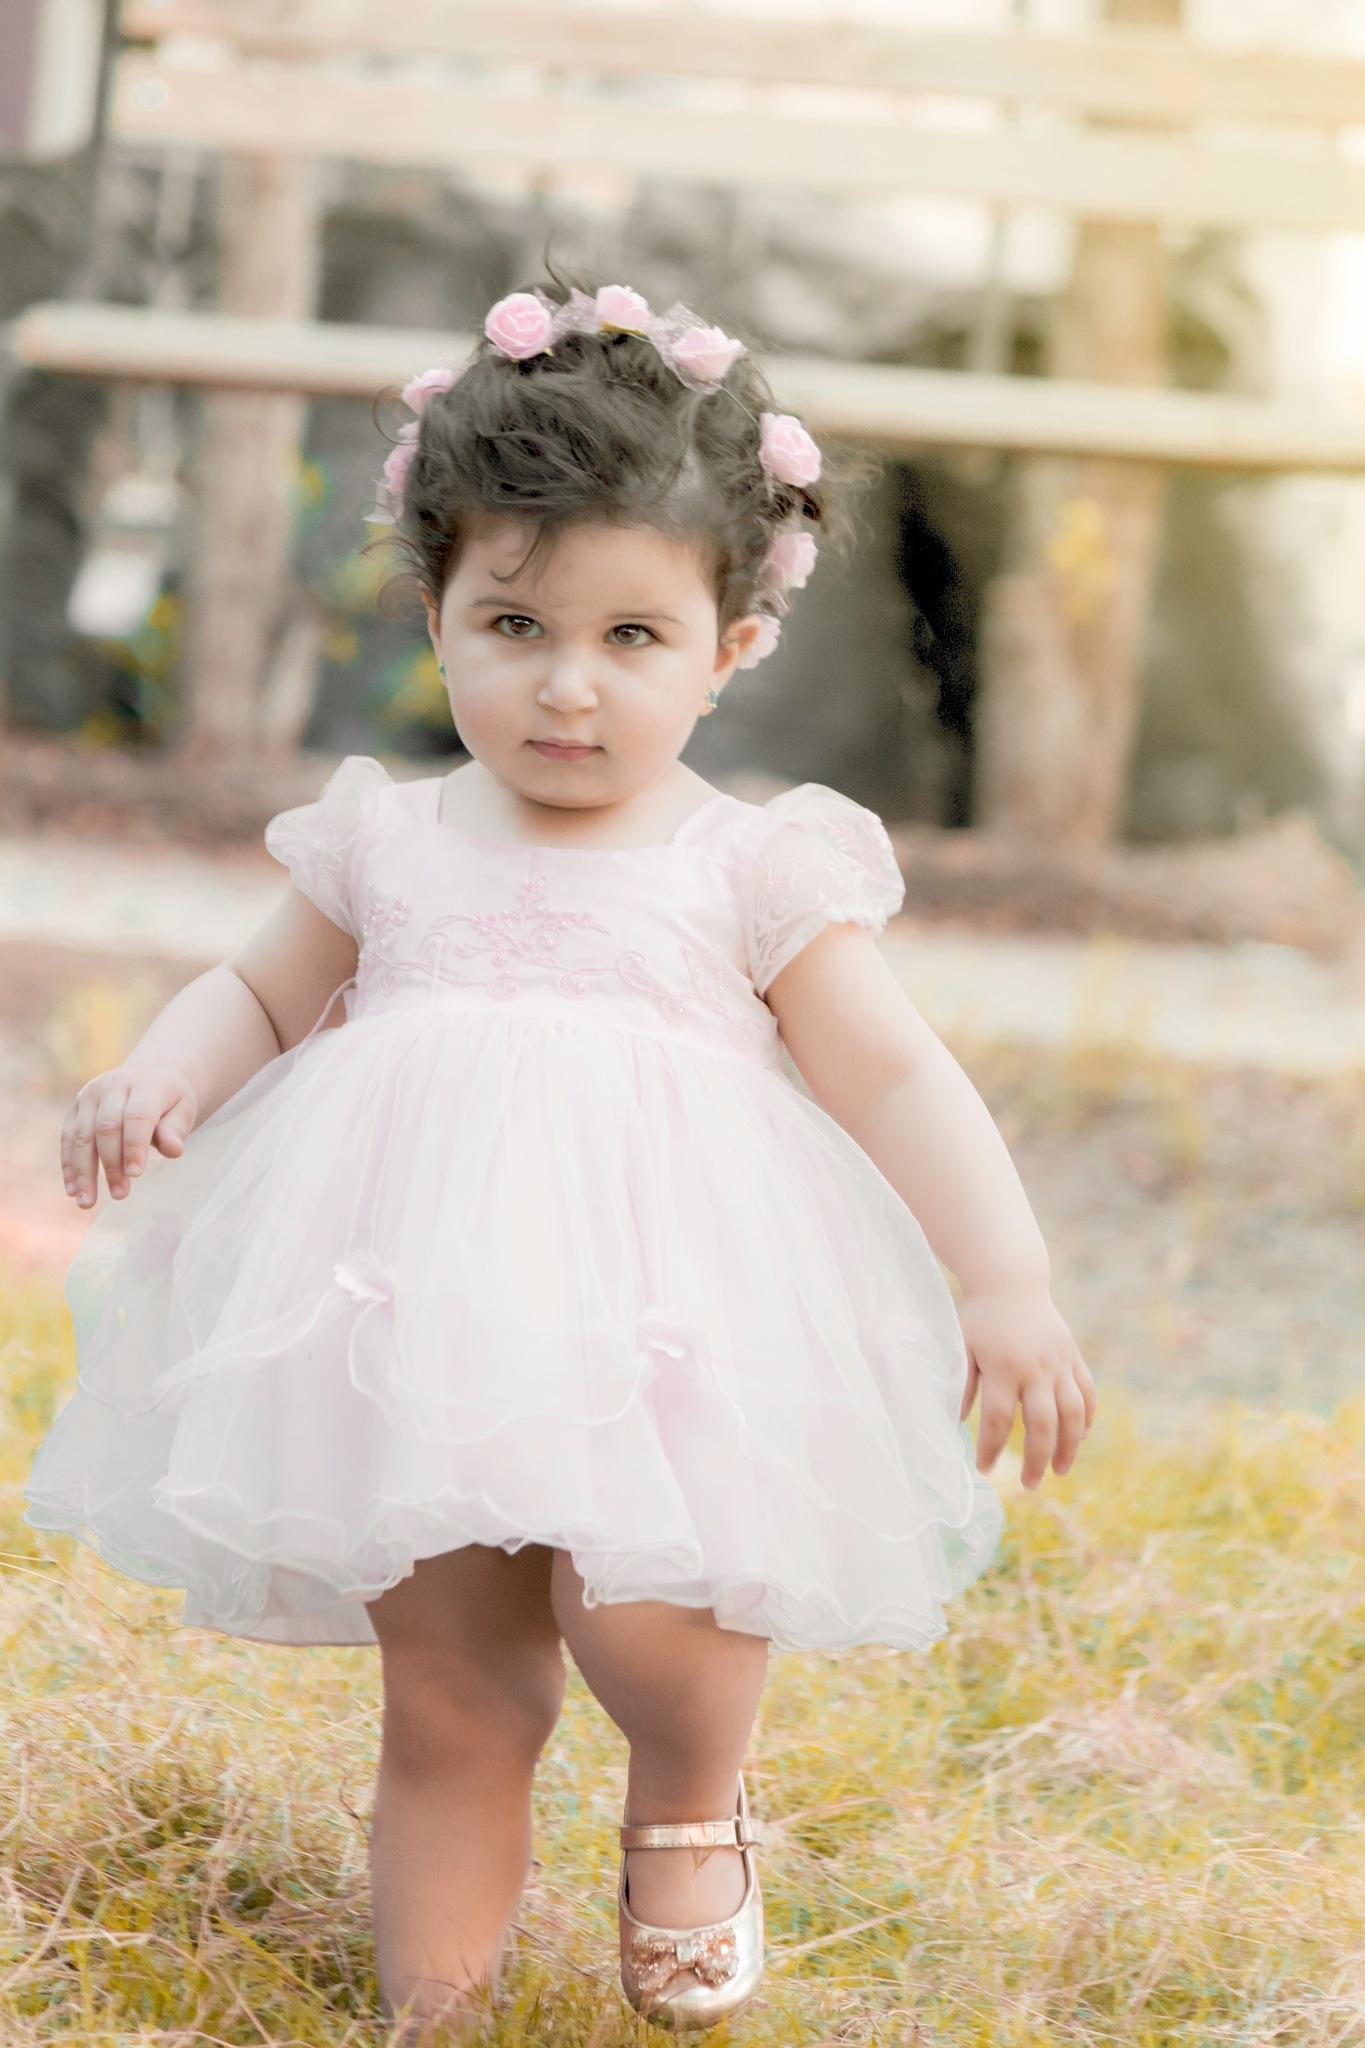 The Child by Mujtaba Ziyad